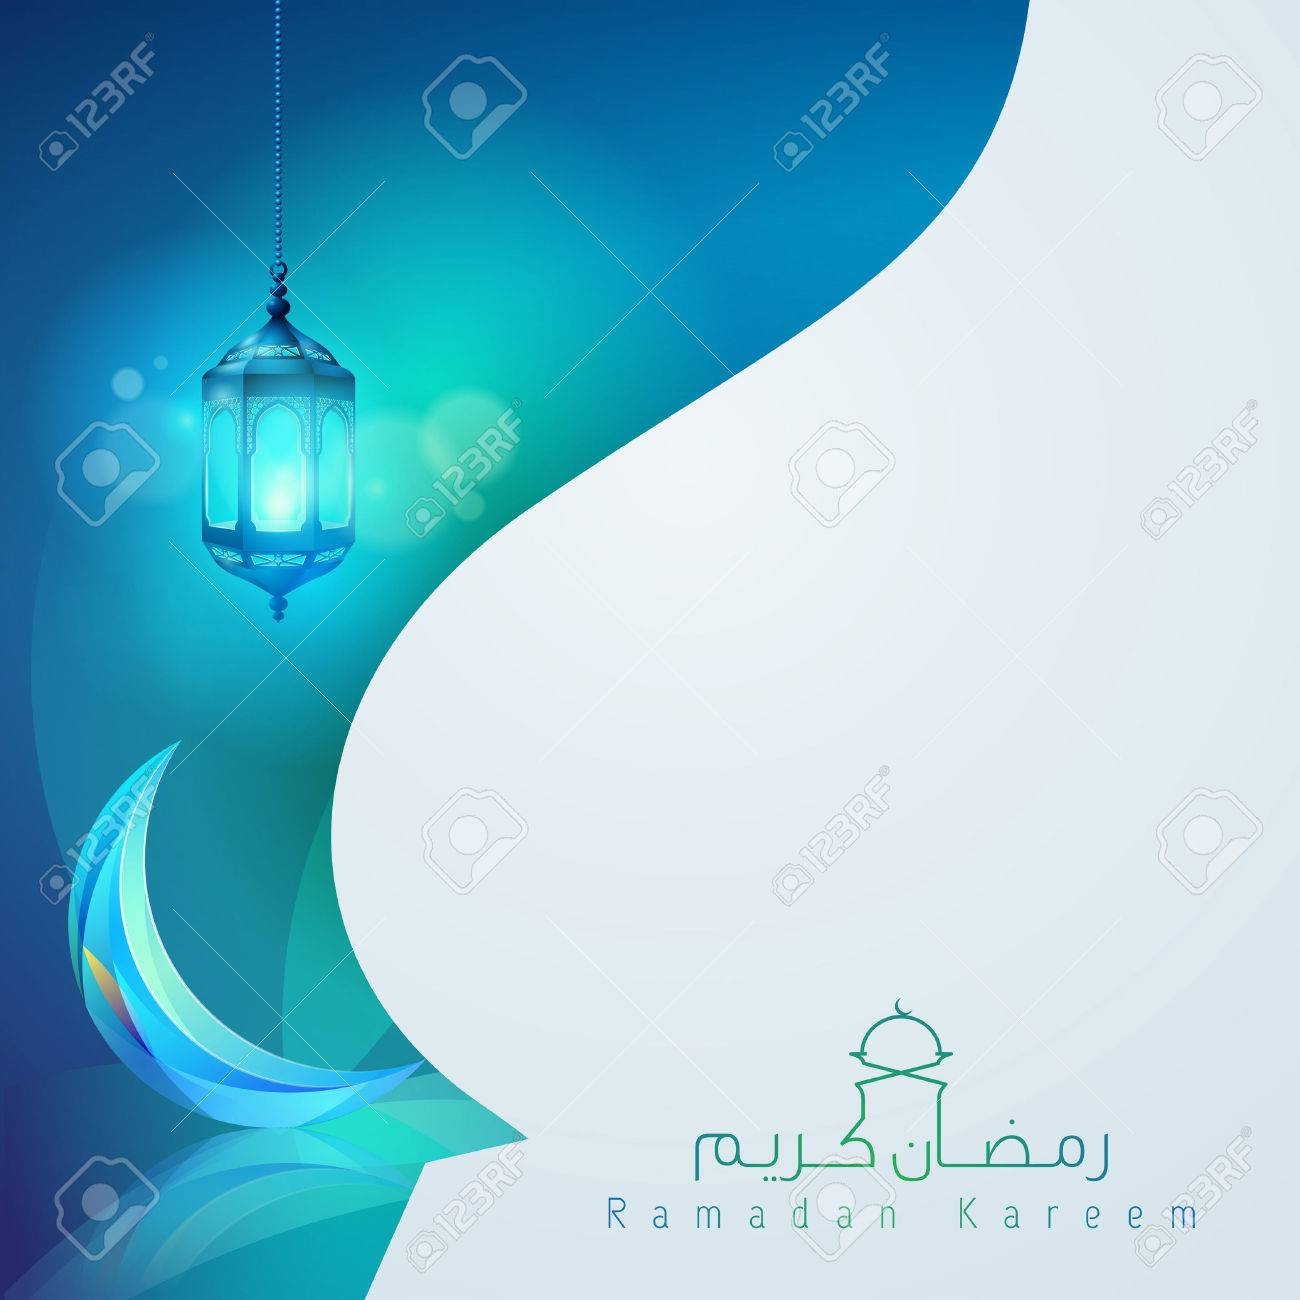 Ramadan Kareem Greeting Card Template Design Royalty Free Cliparts